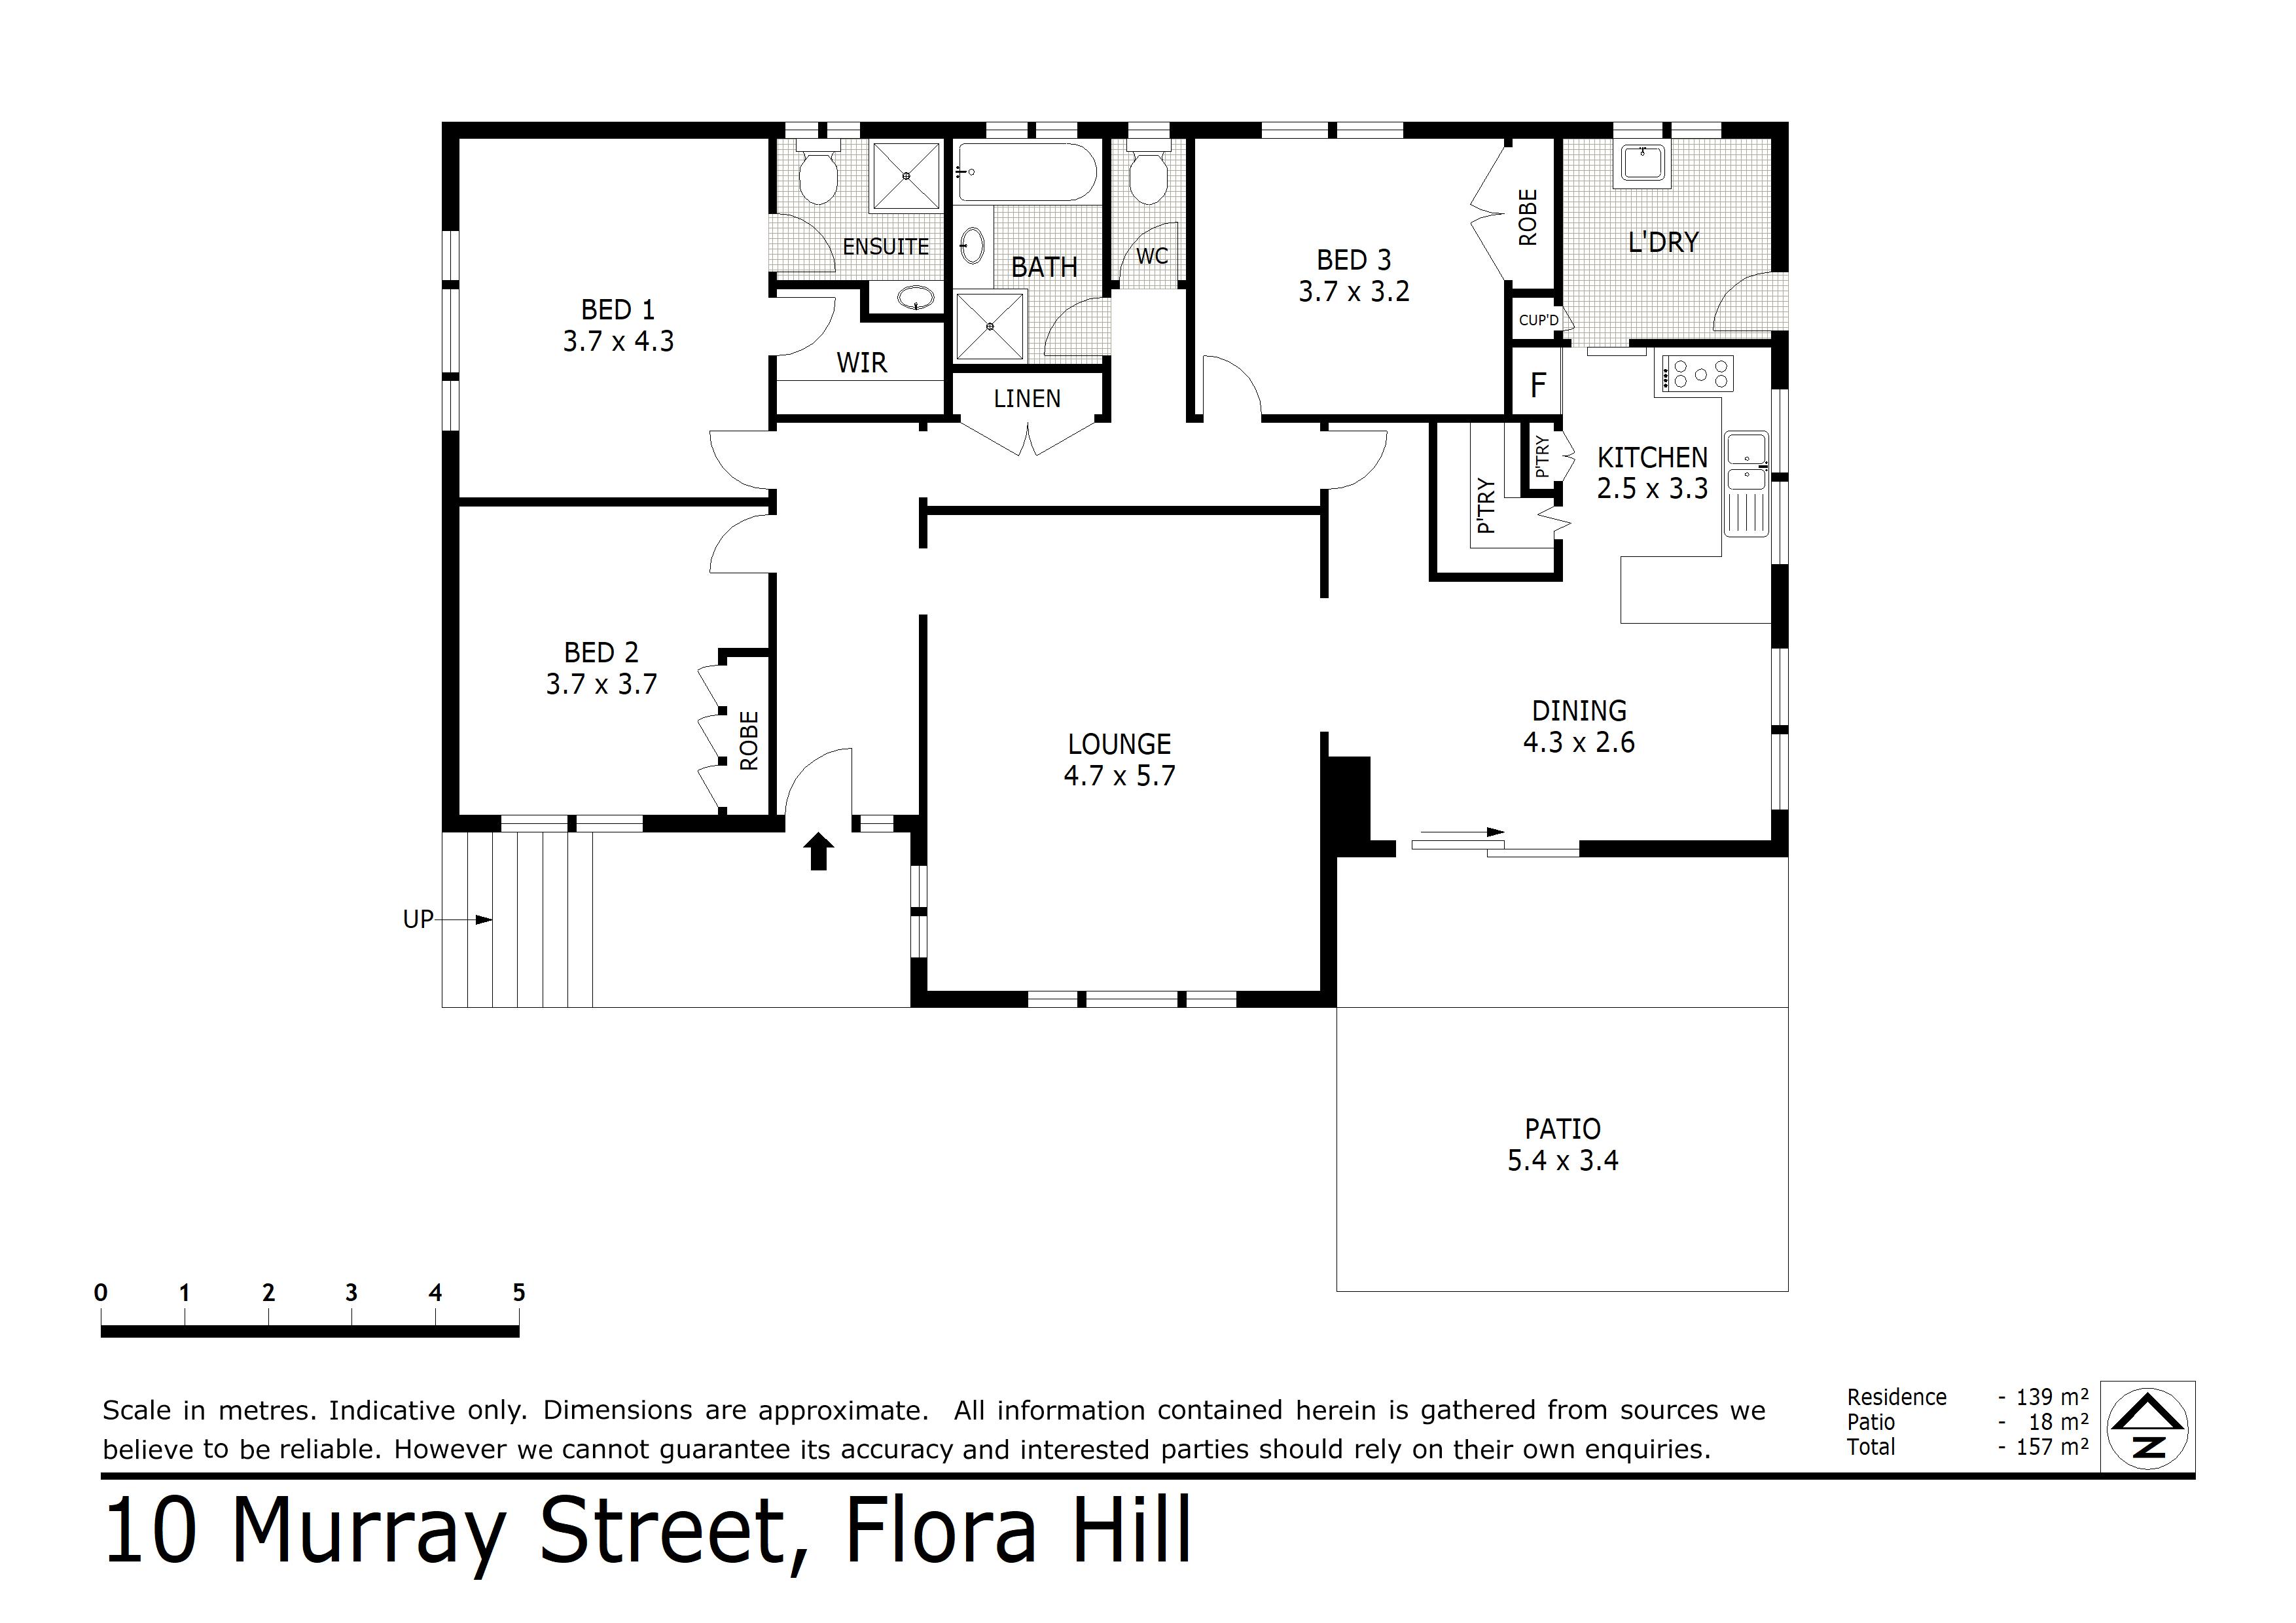 Lot 5 / 10 Murray Street, Flora Hill, VIC 3550